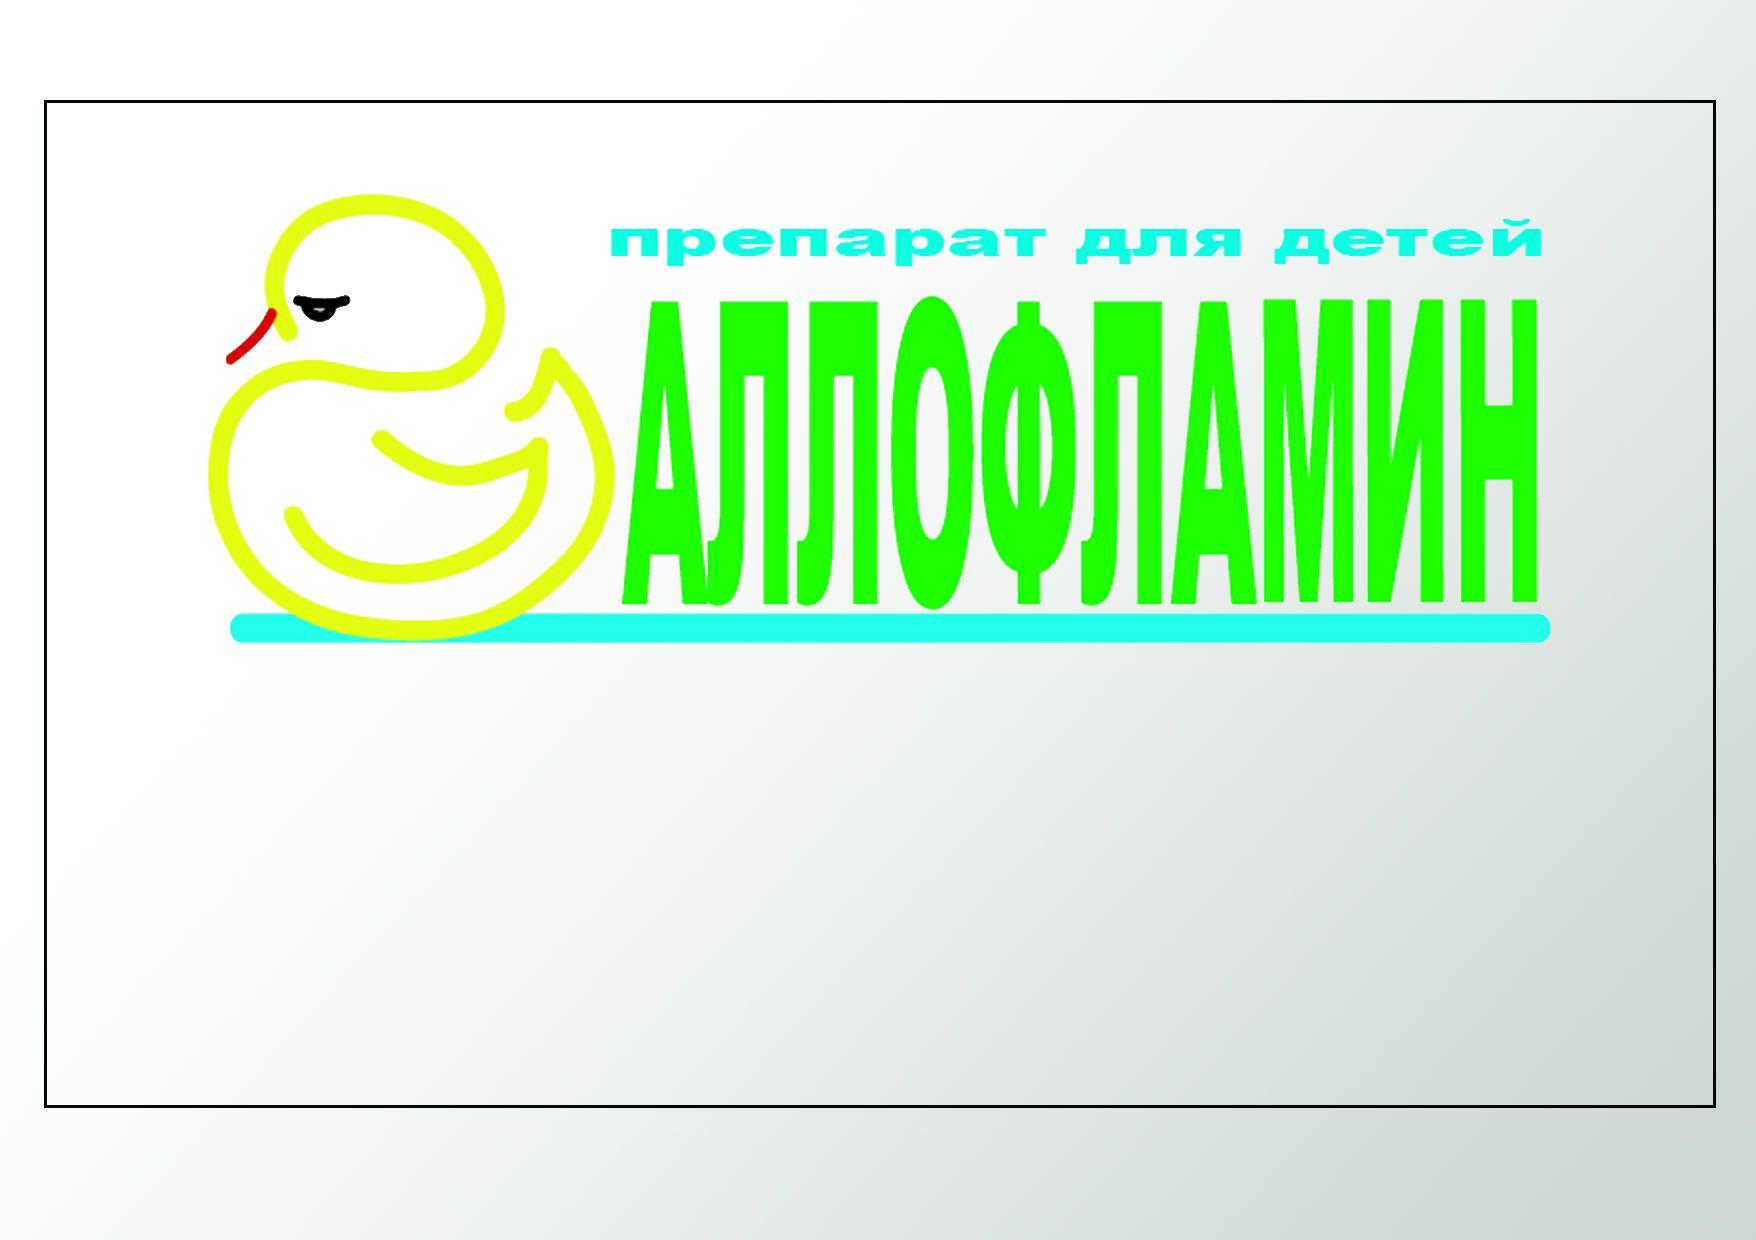 Логотип препарата Аллофламин - дизайнер velo